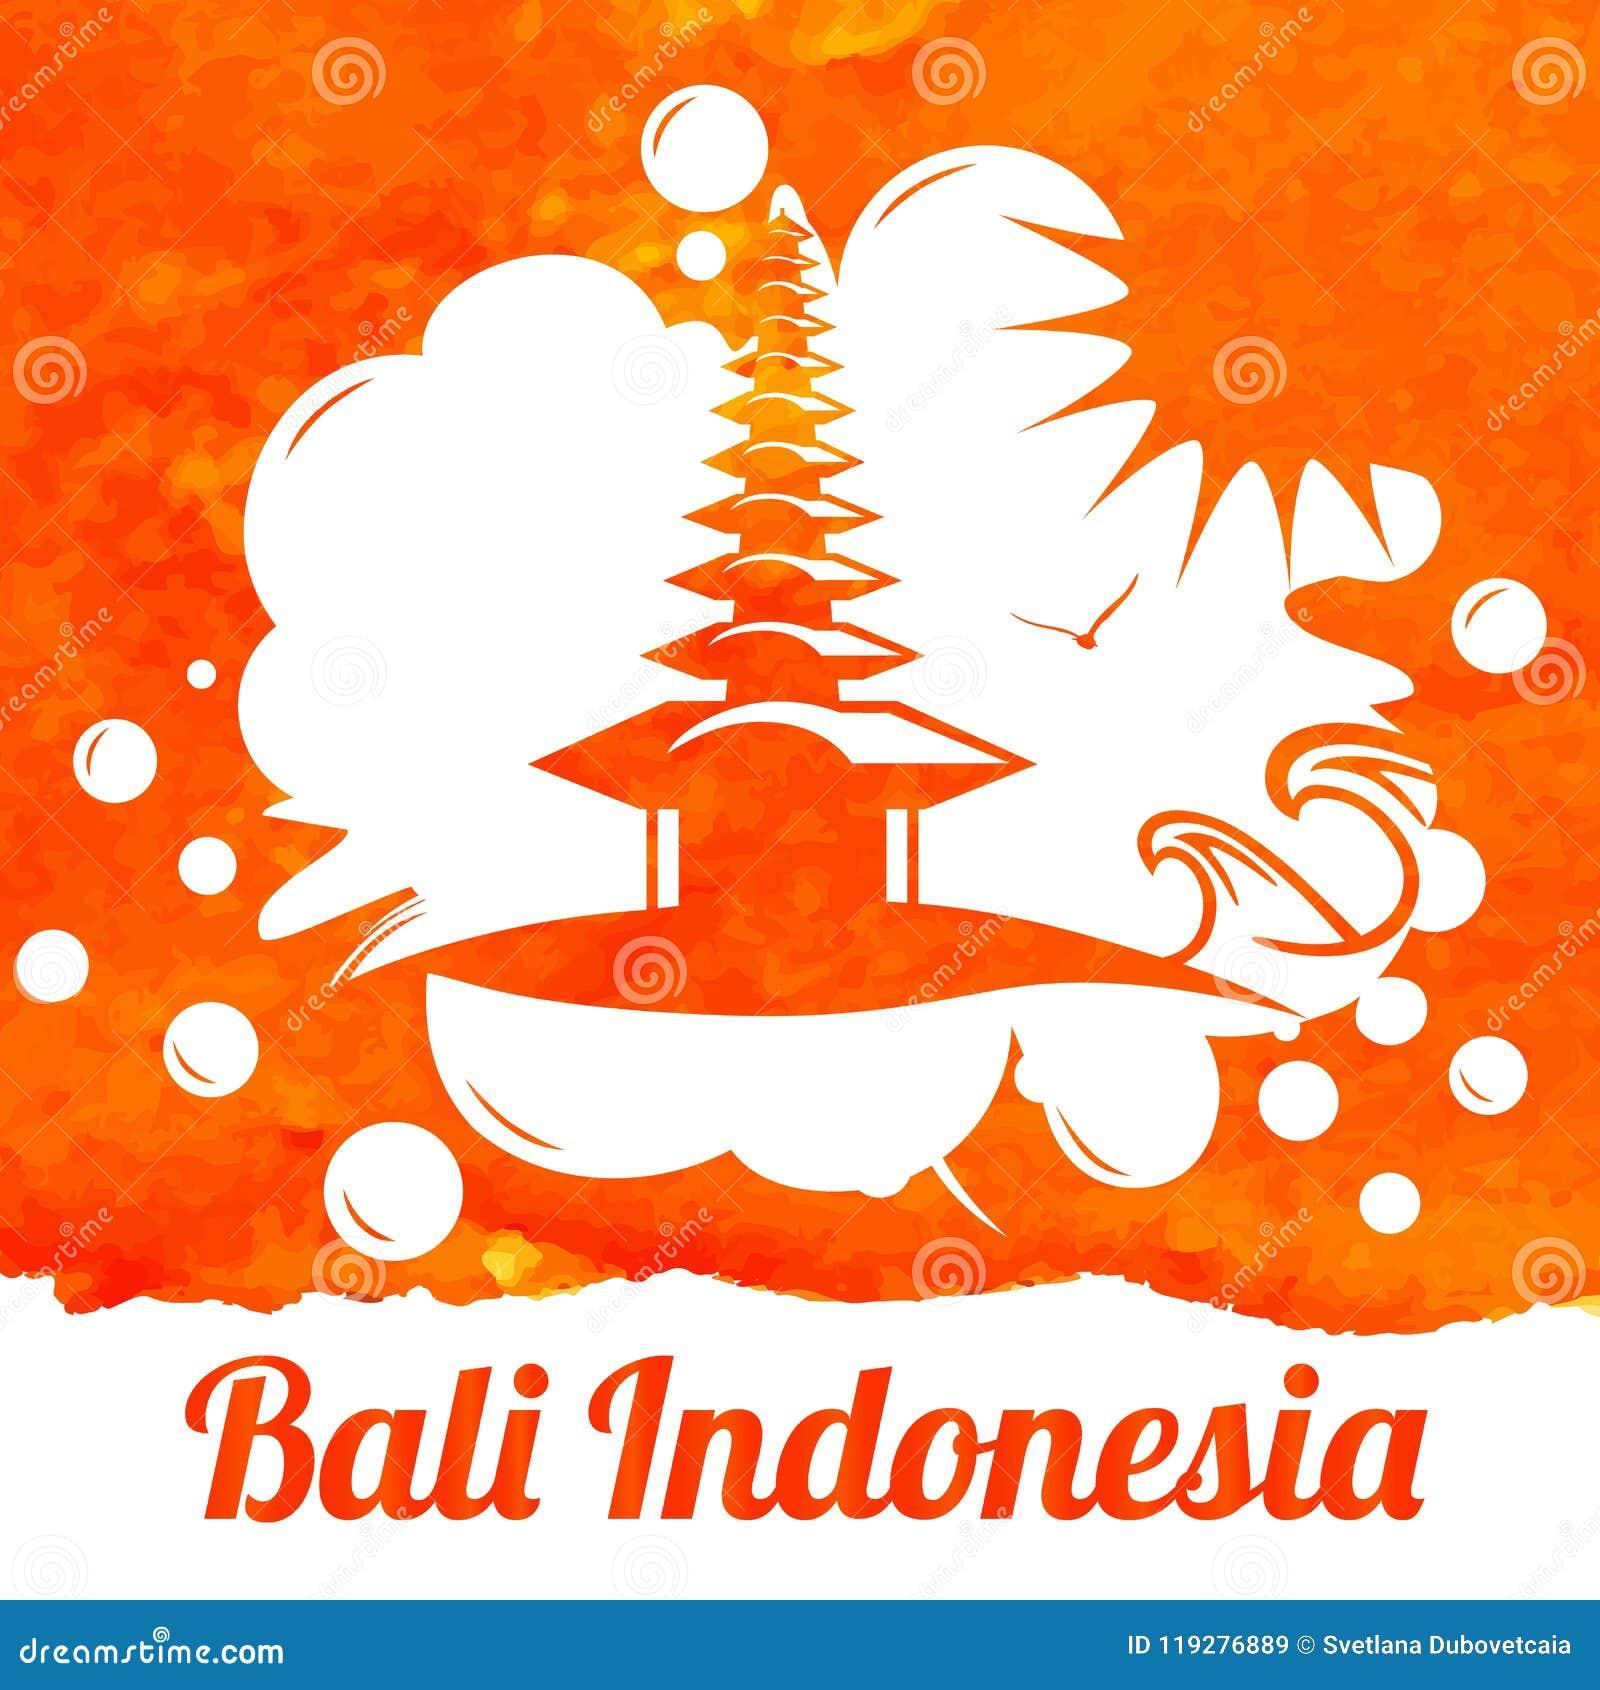 Bali Indonesian Landscape Watercolor Bali In Indonesia View Hand